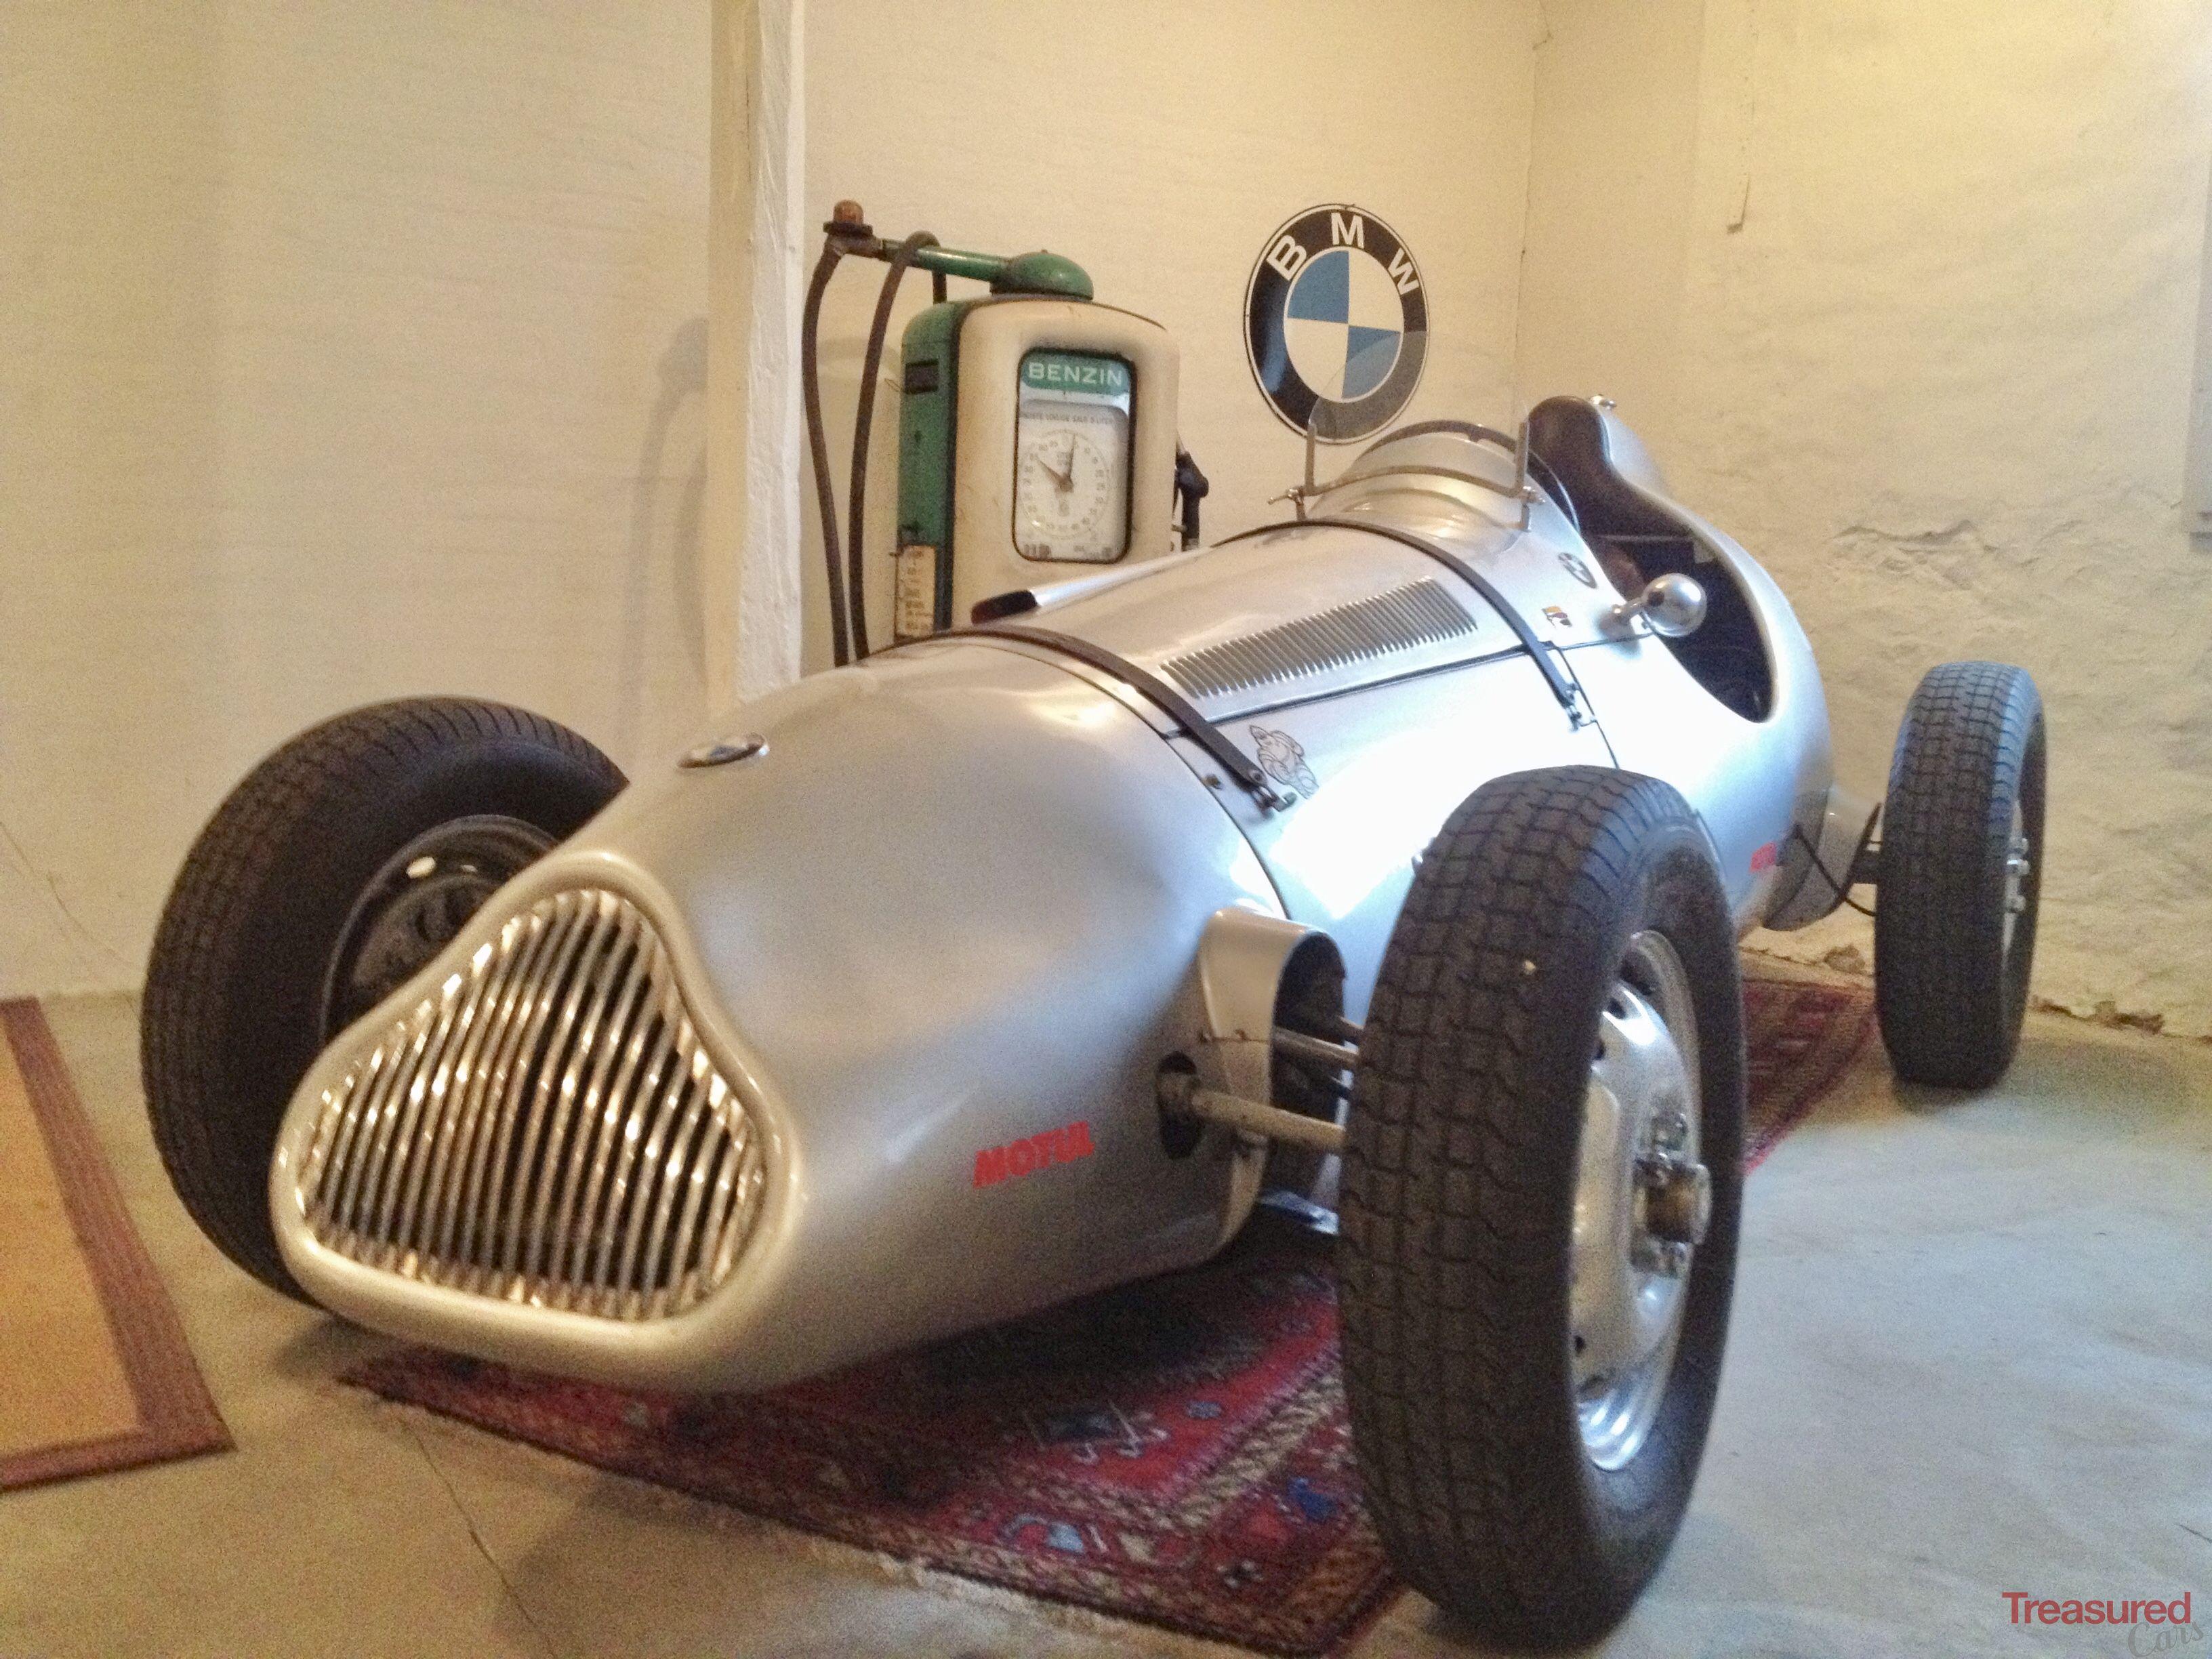 1946 BMW Formula 2 Racing Car Classic Cars for sale - Treasured Cars